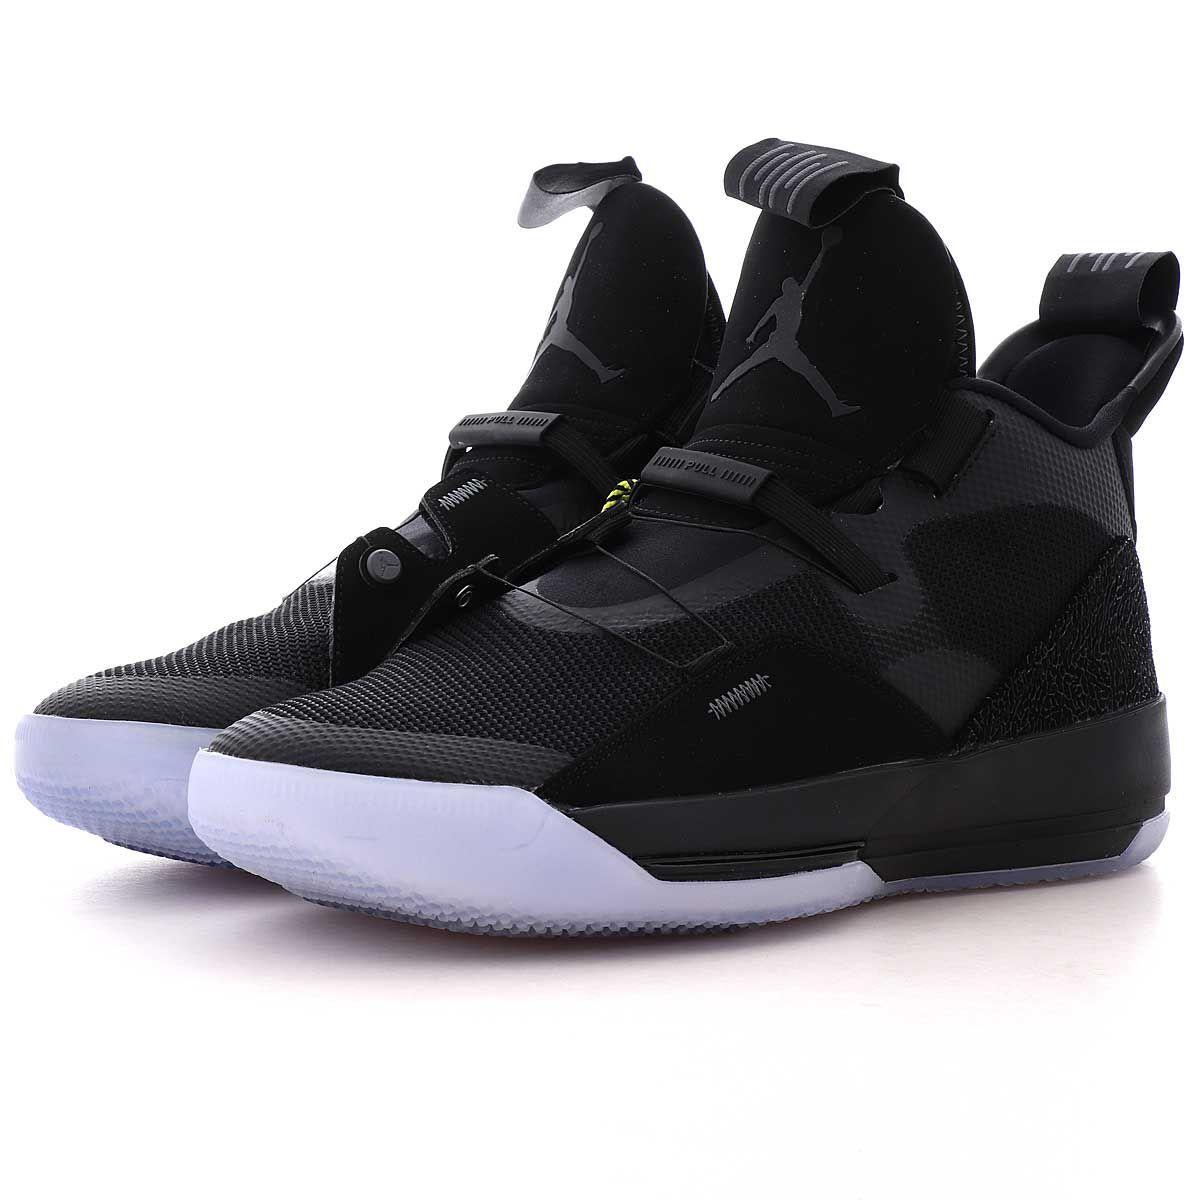 Sneaker boots, Jordans sneakers